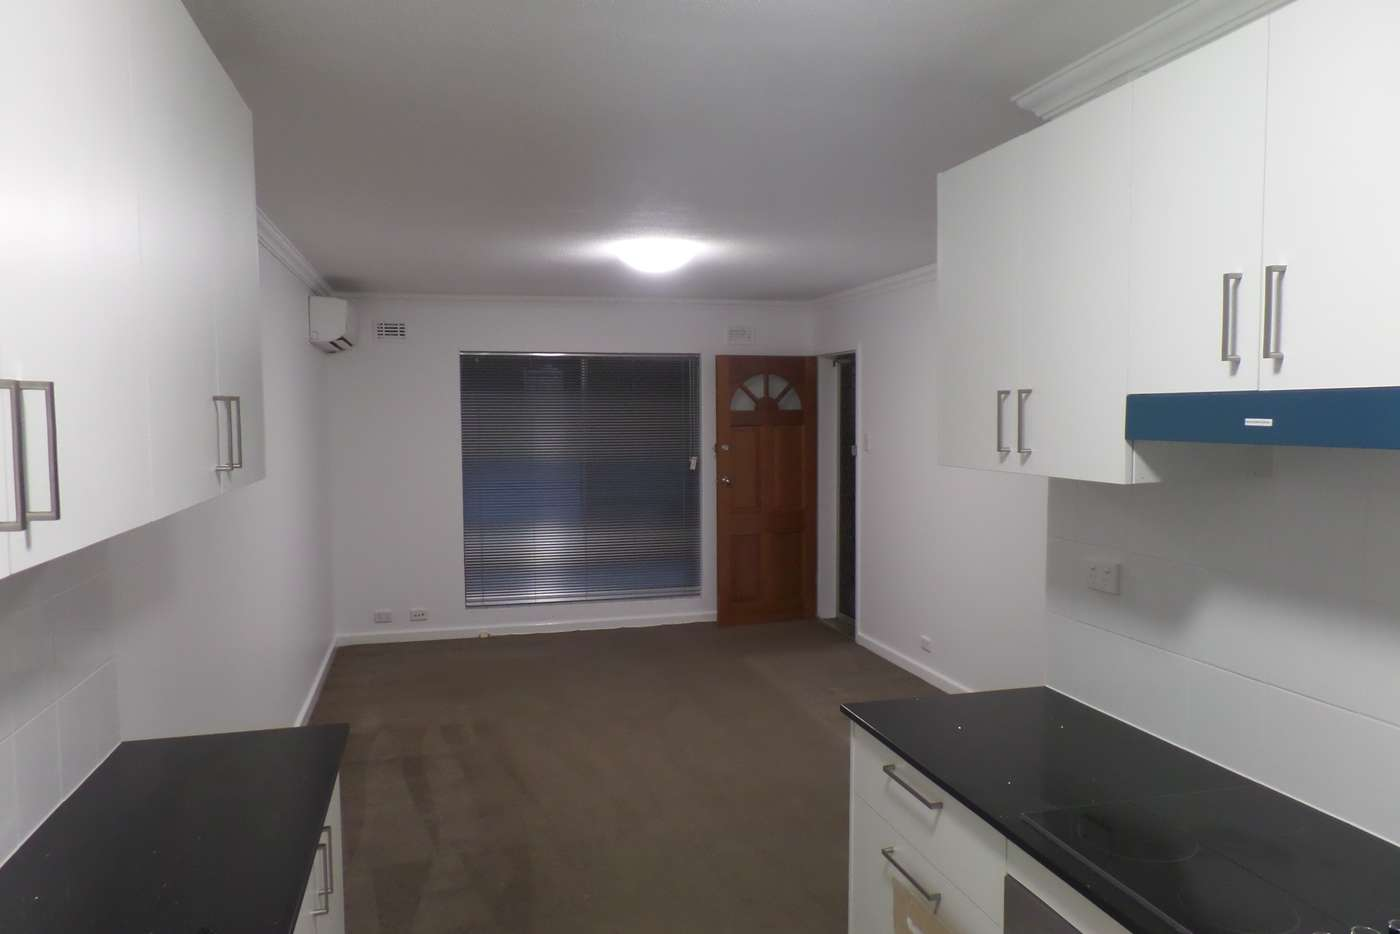 Sixth view of Homely unit listing, 3/29 Heard Way, Glendalough WA 6016